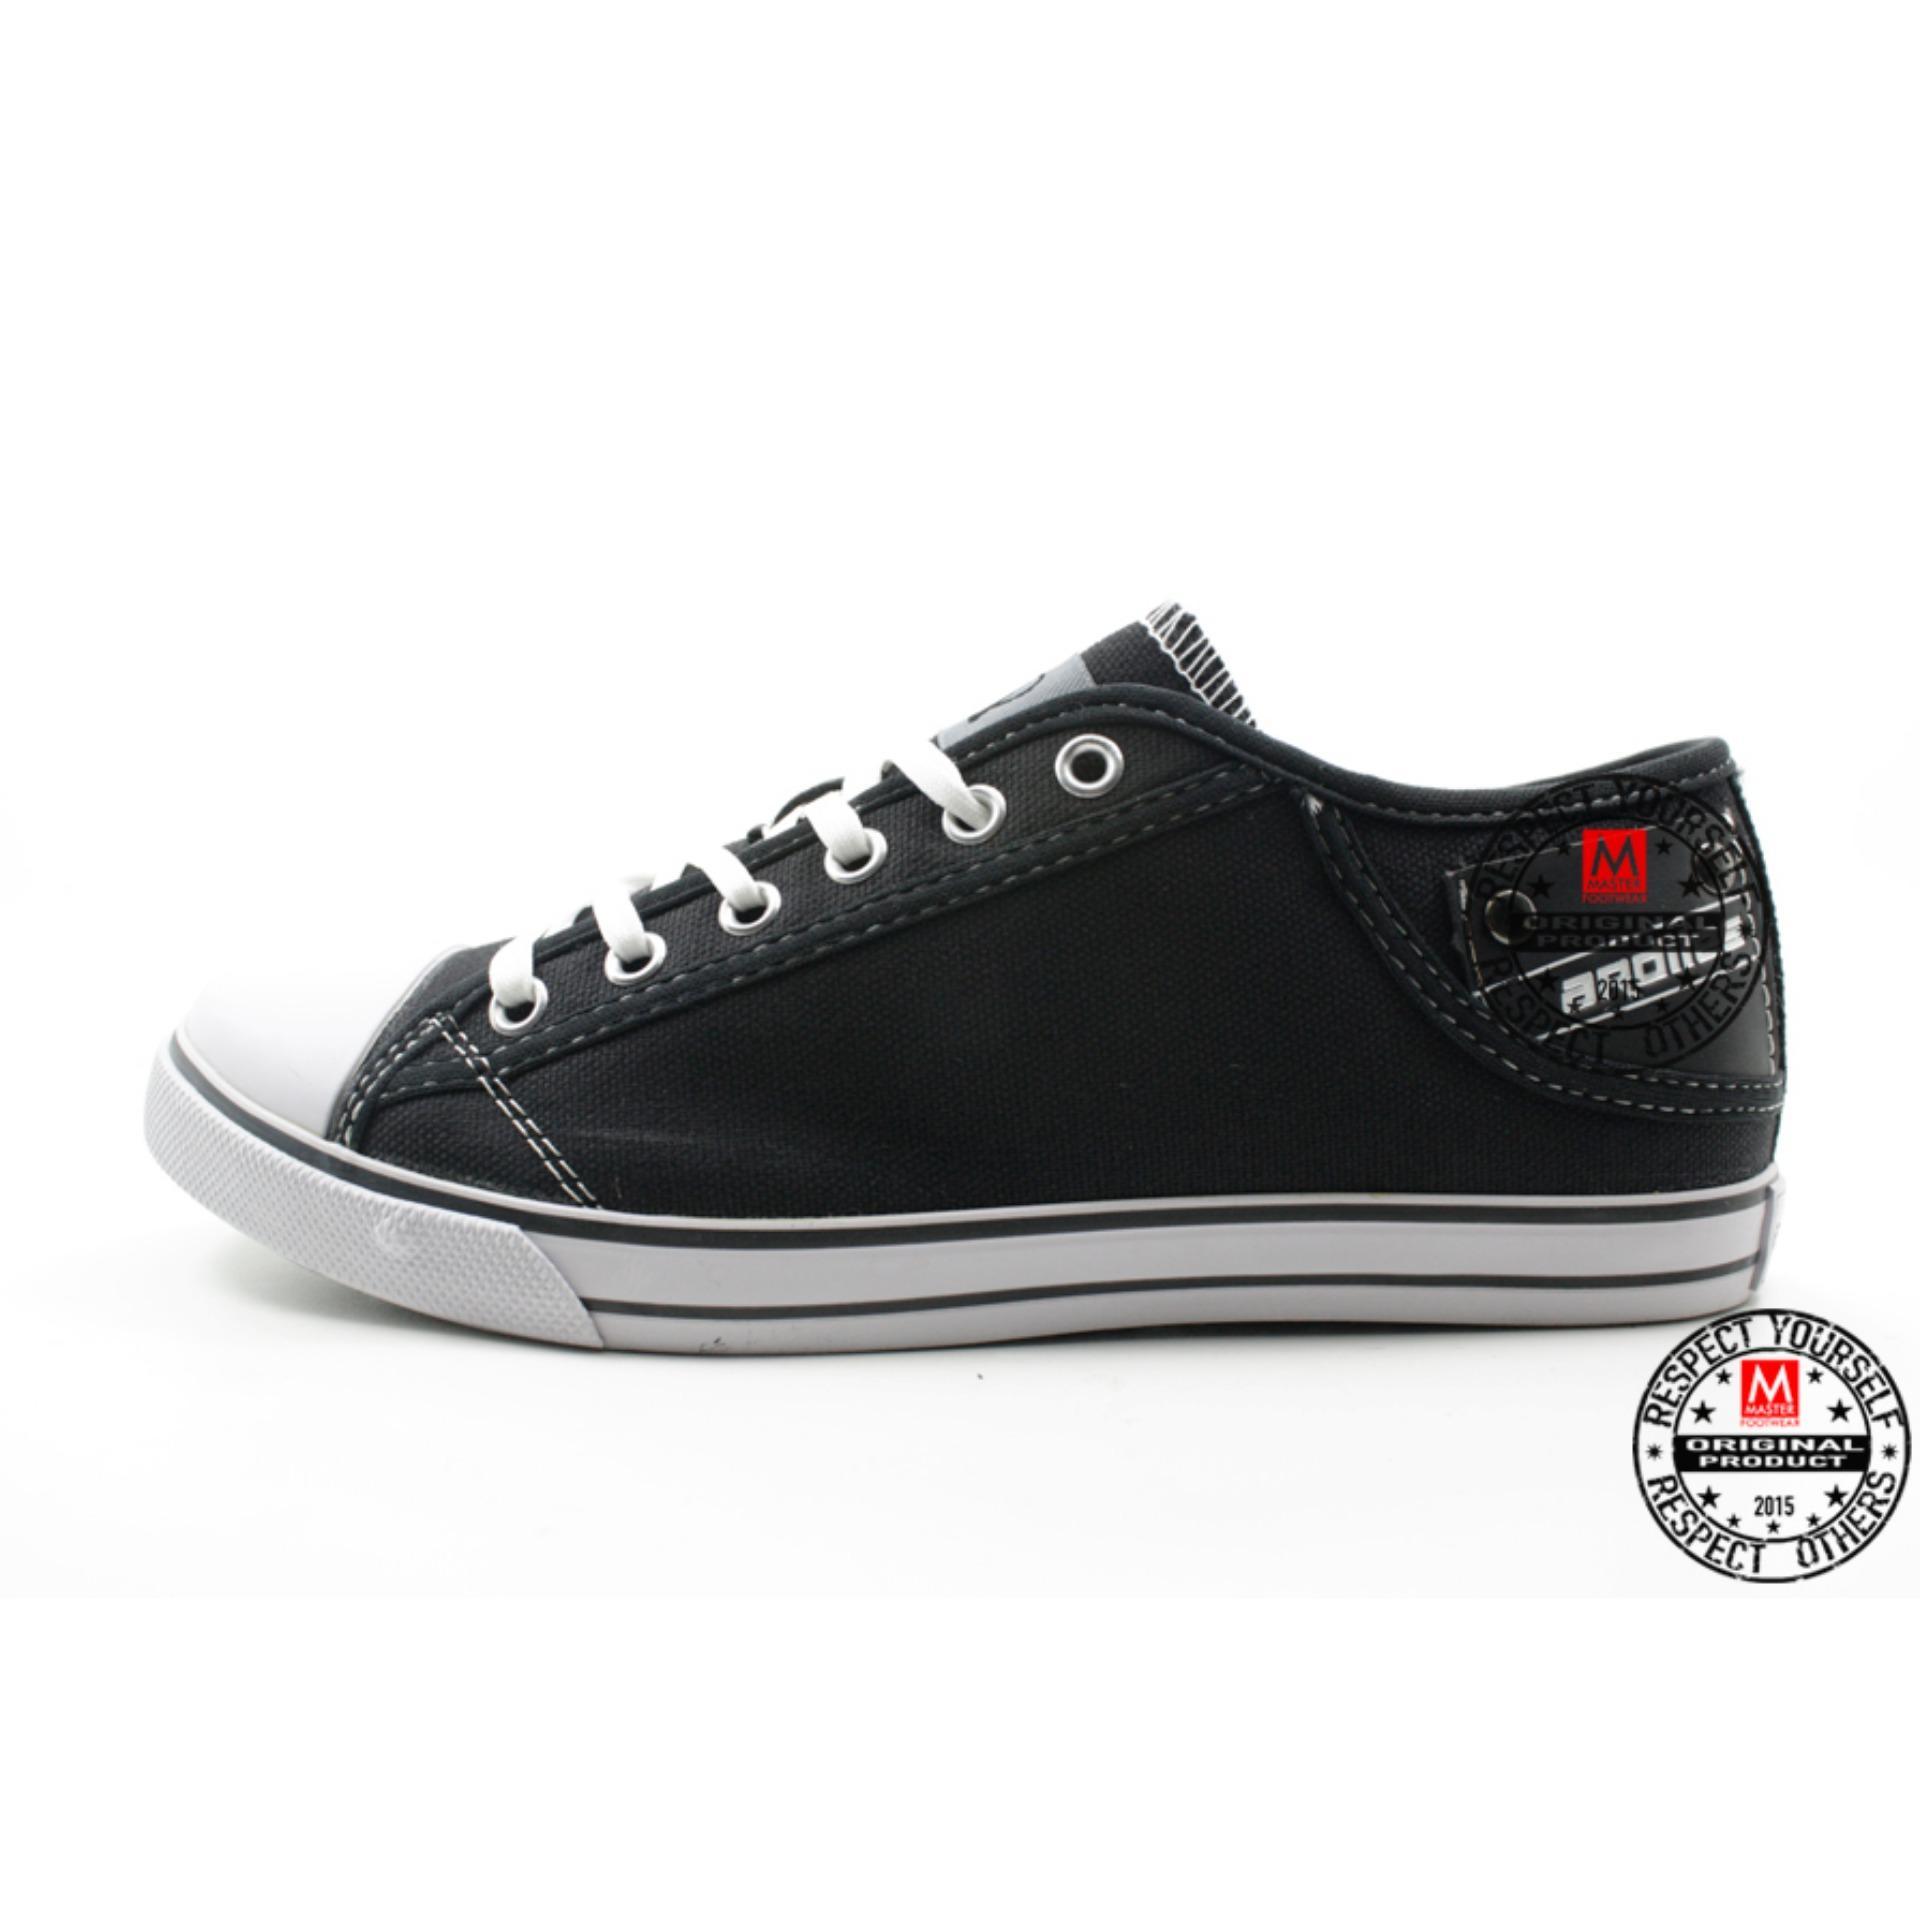 New Casual Shoes From Ardiles Sepatu Sandal Cartz Navi List Roberto Pria Canvas Calisto Hitam Putih